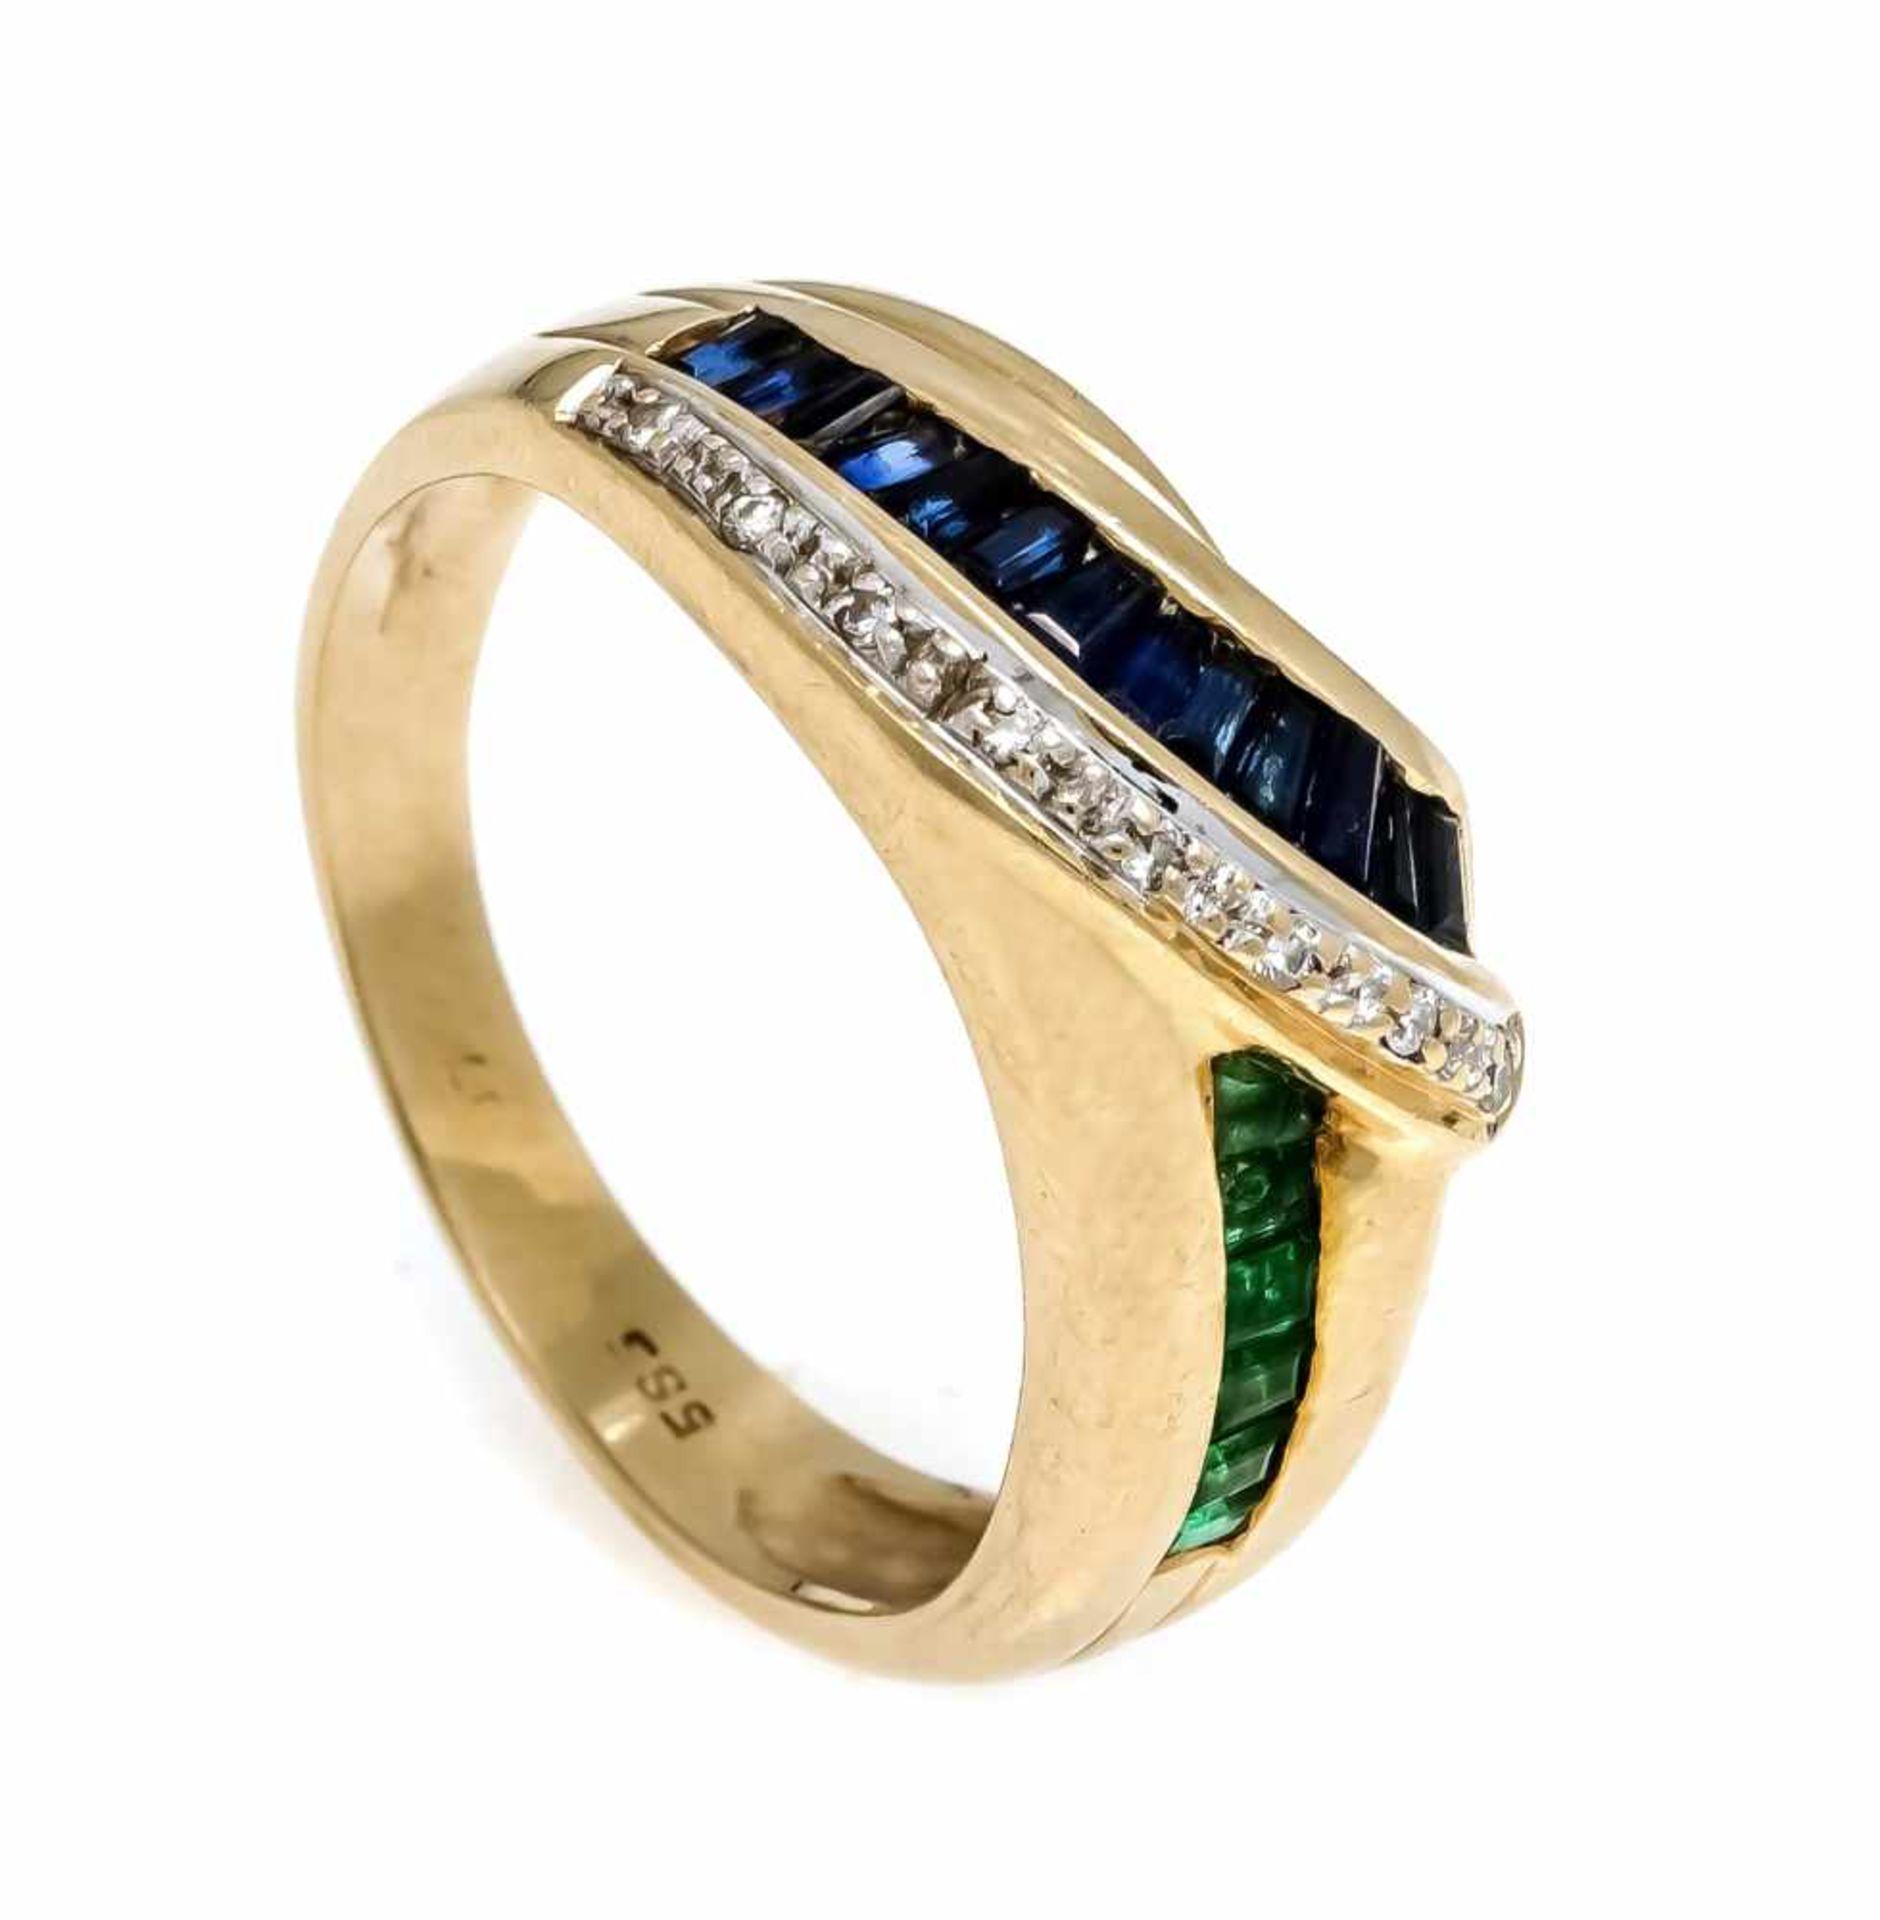 Saphir-Smaragd-Brillant-Ring GG 585/000 mit baguetteförmig fac. Saphiren 2,5 mm, carréförmig fac.